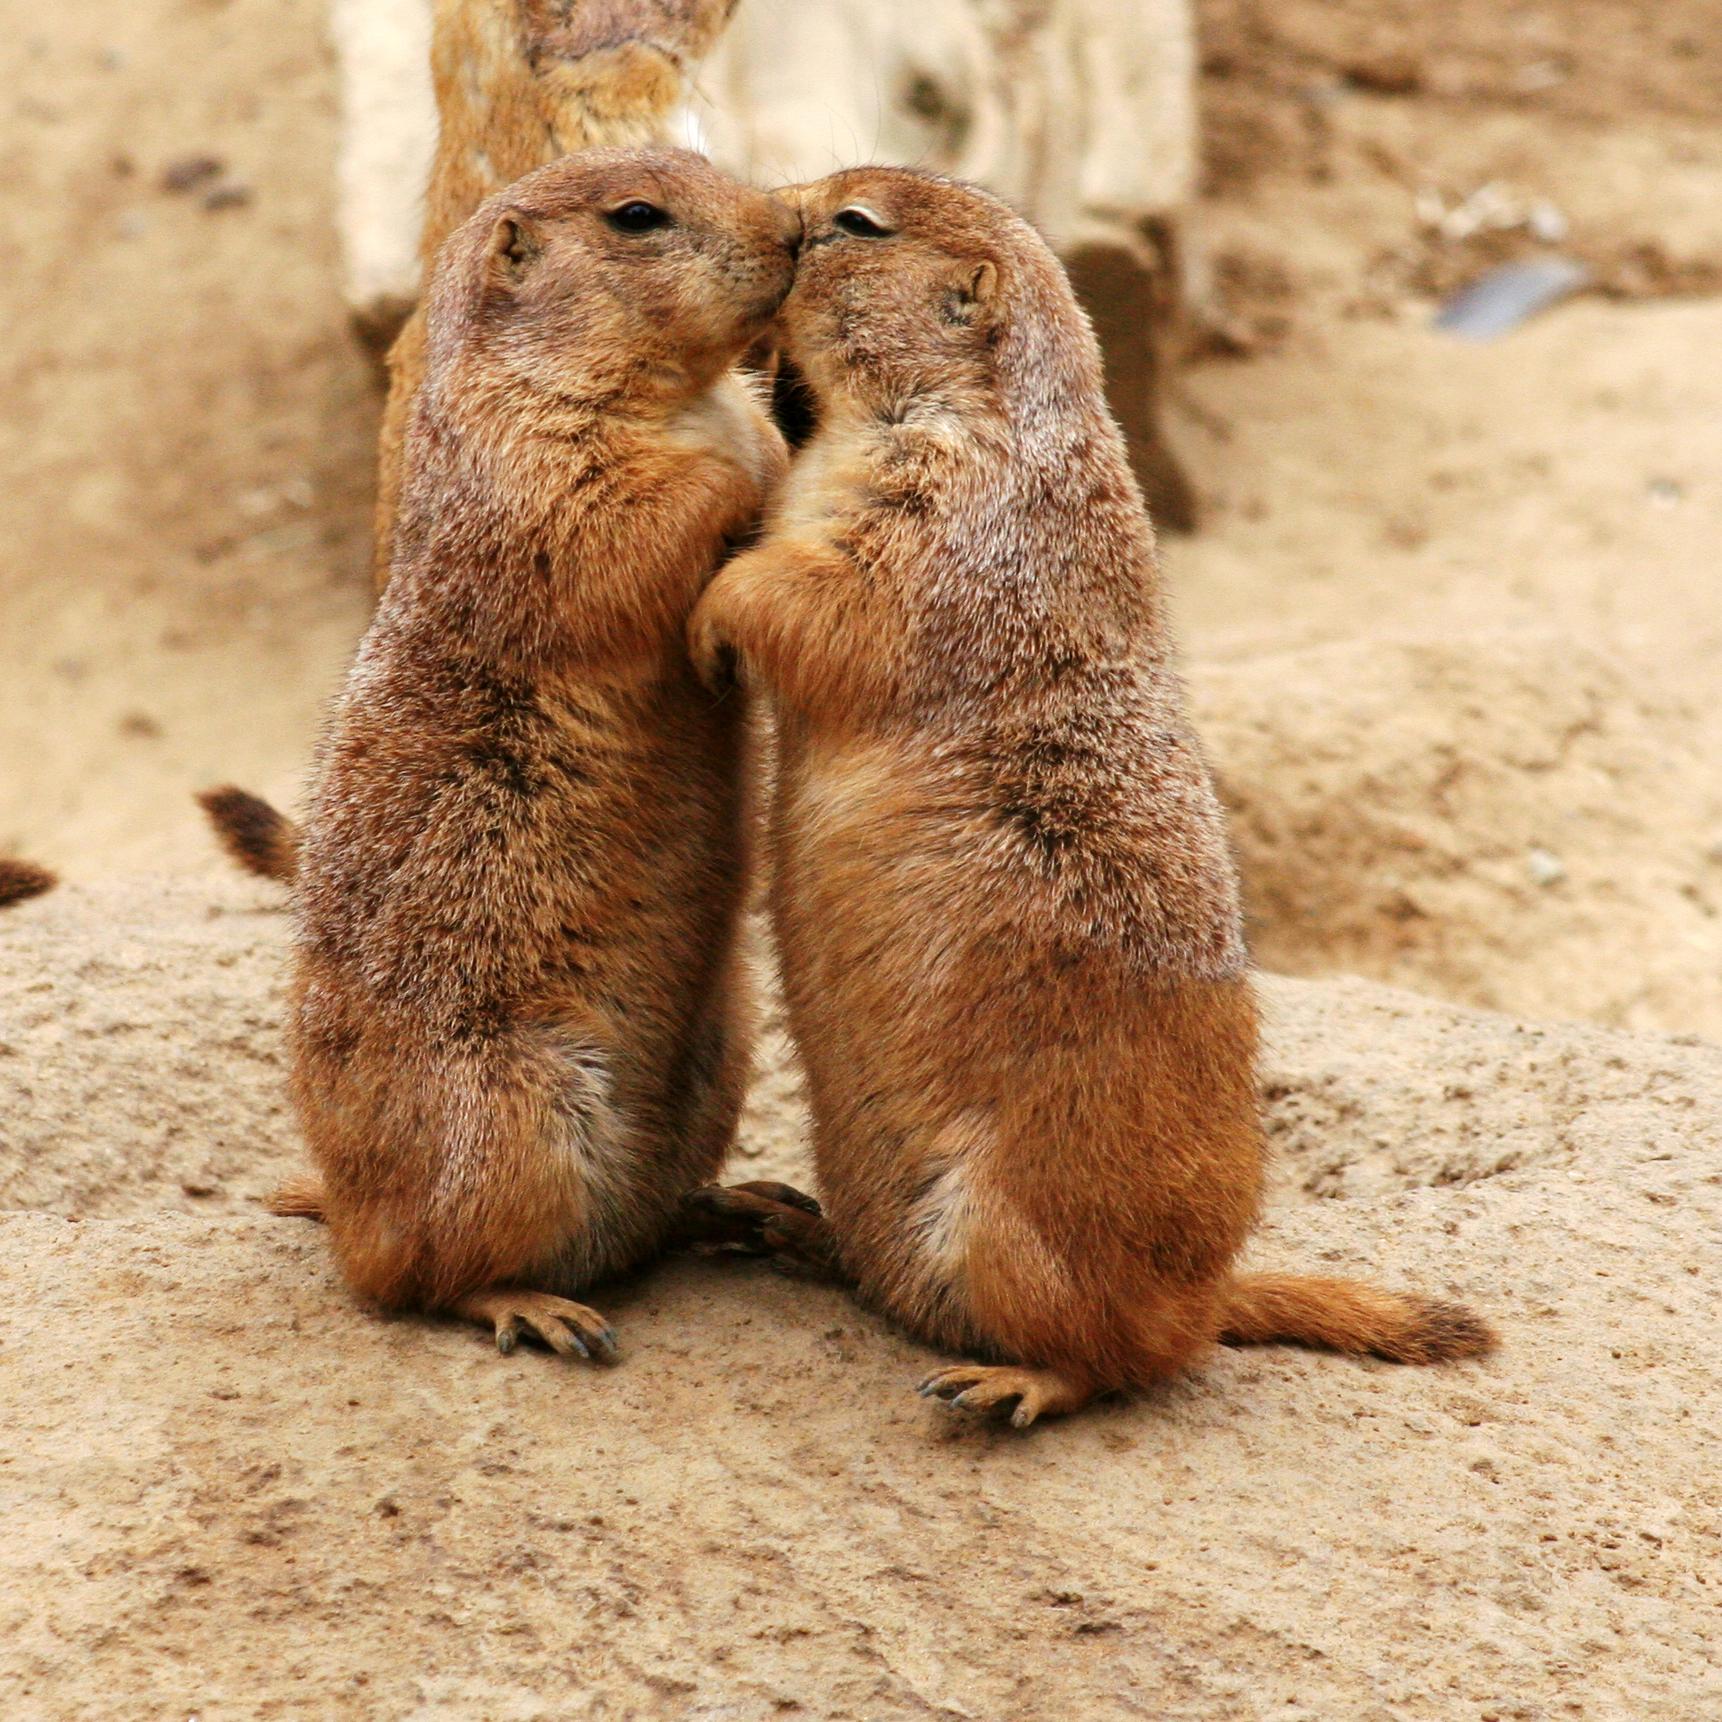 Two prairie dogs photo